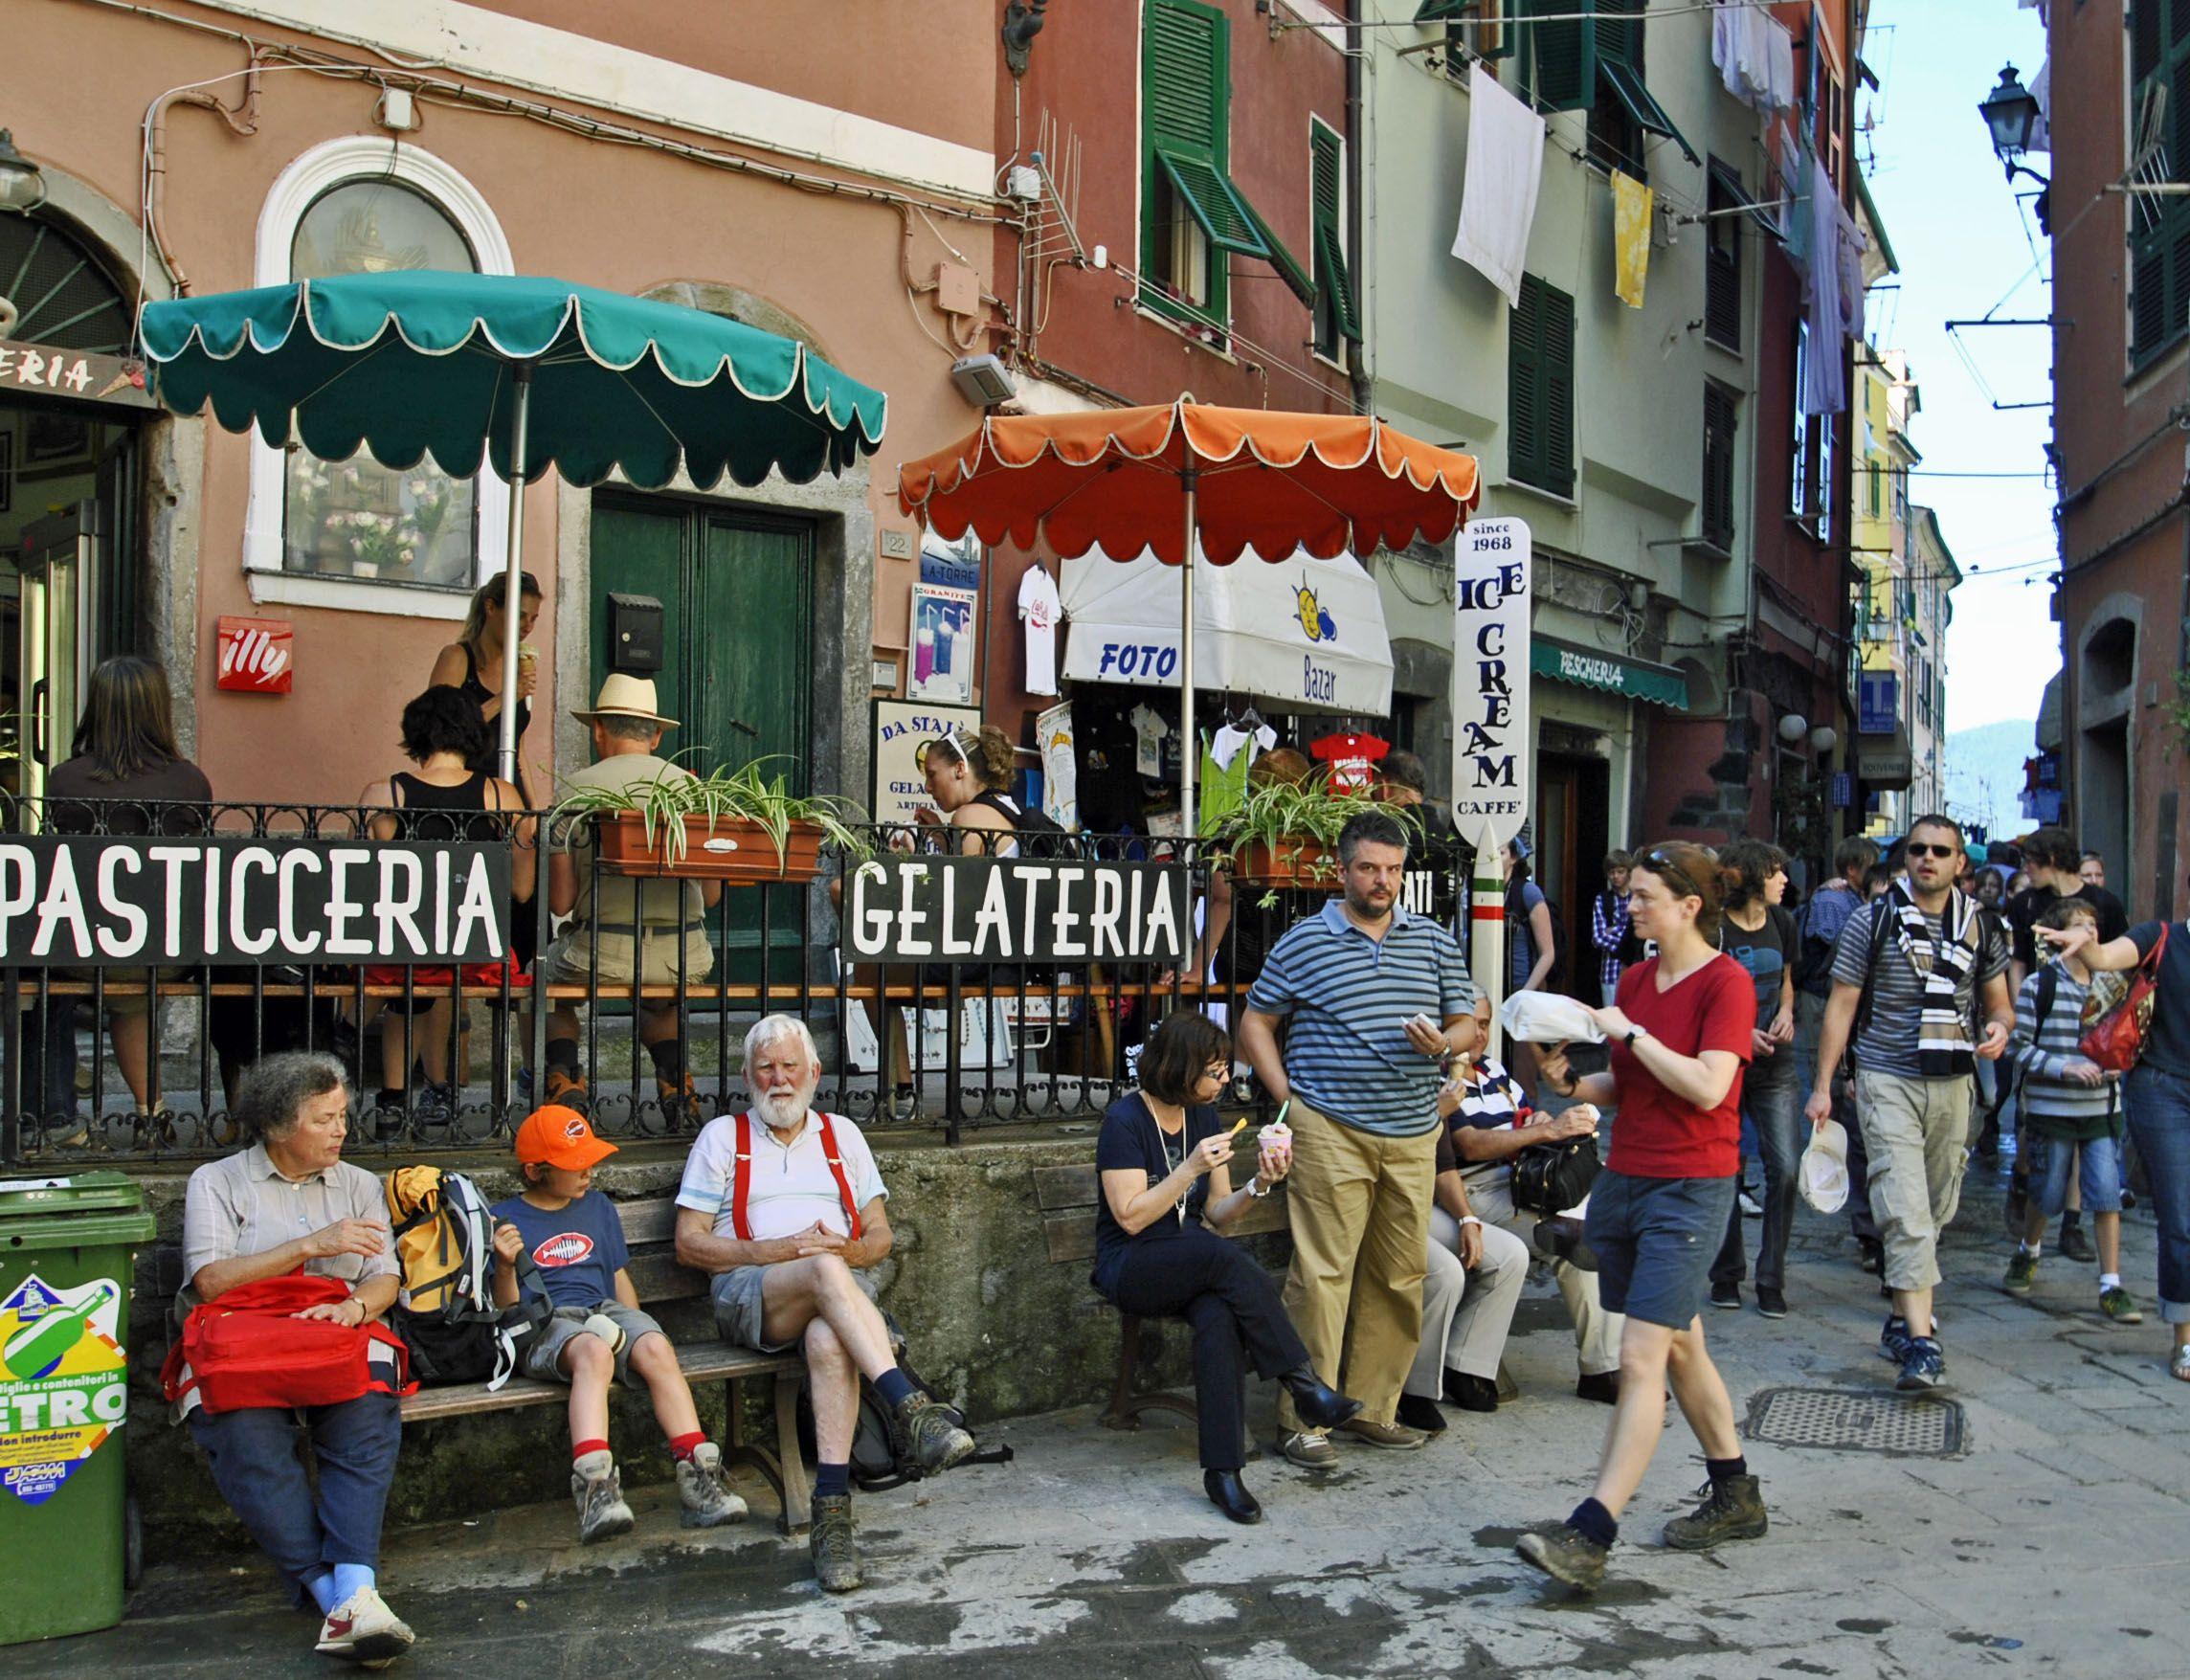 Gelateria in Vernazza, Liguria   Living in italy, Italian ...